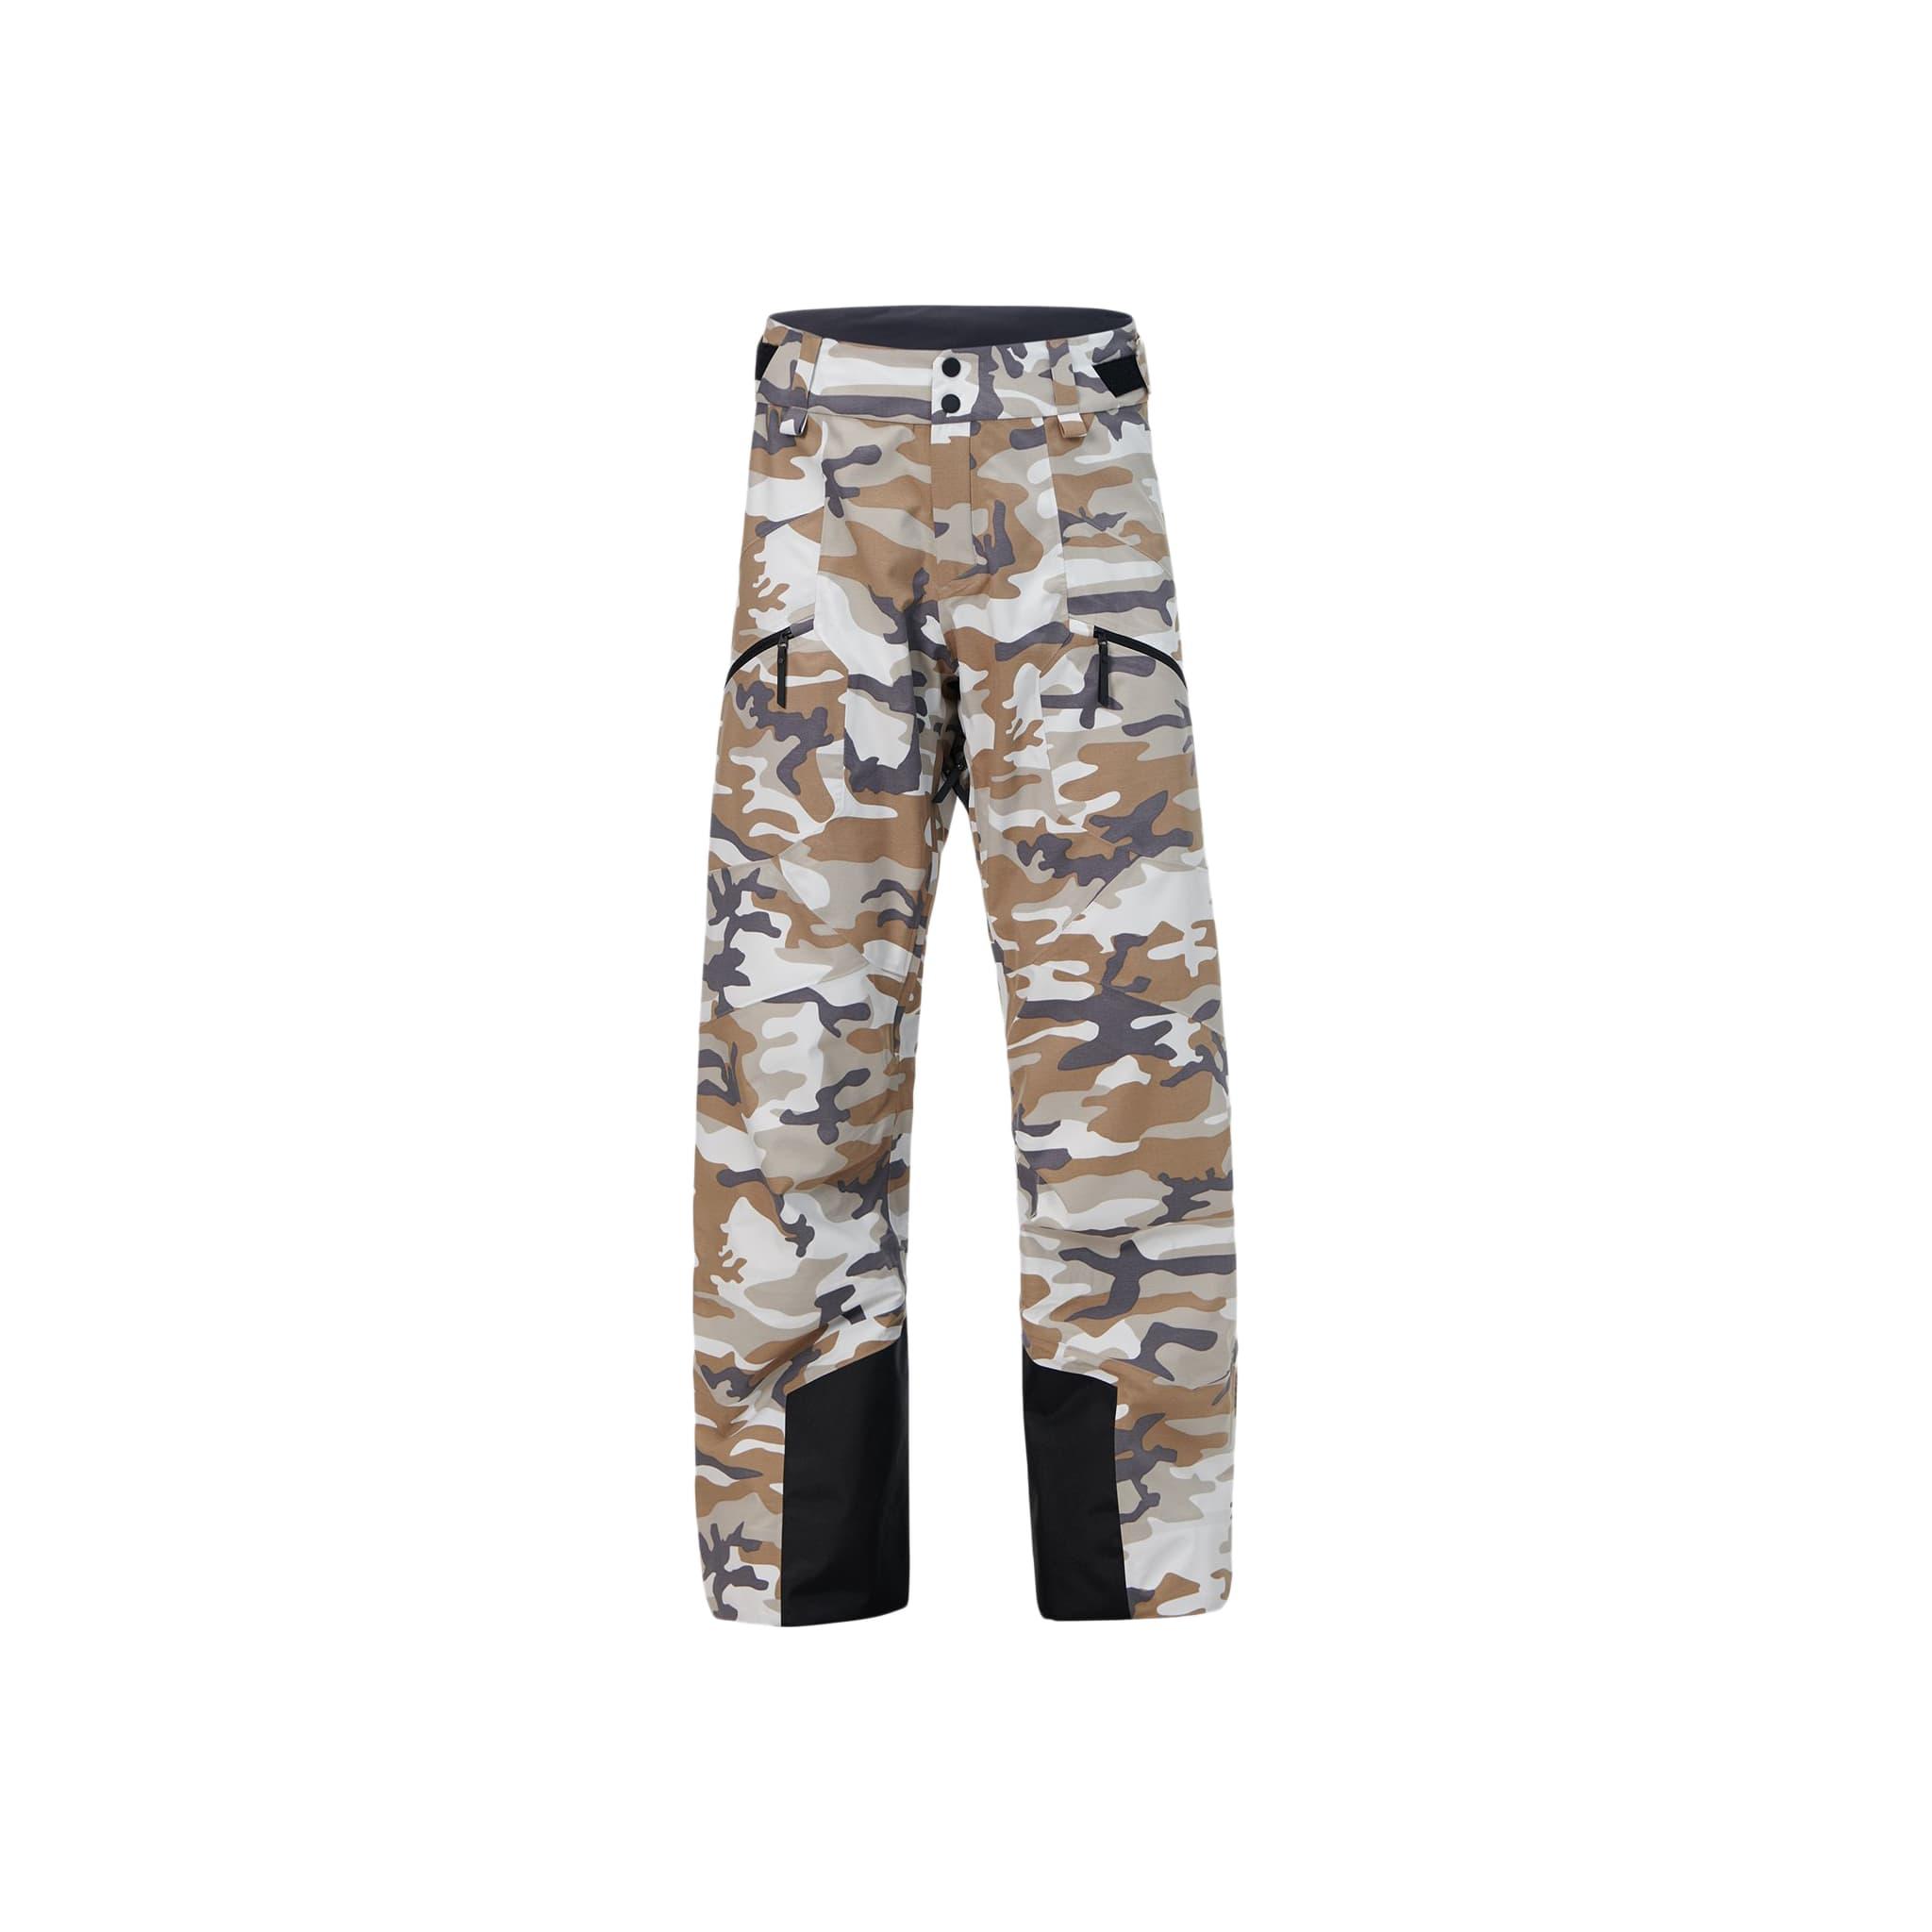 Radical Pants